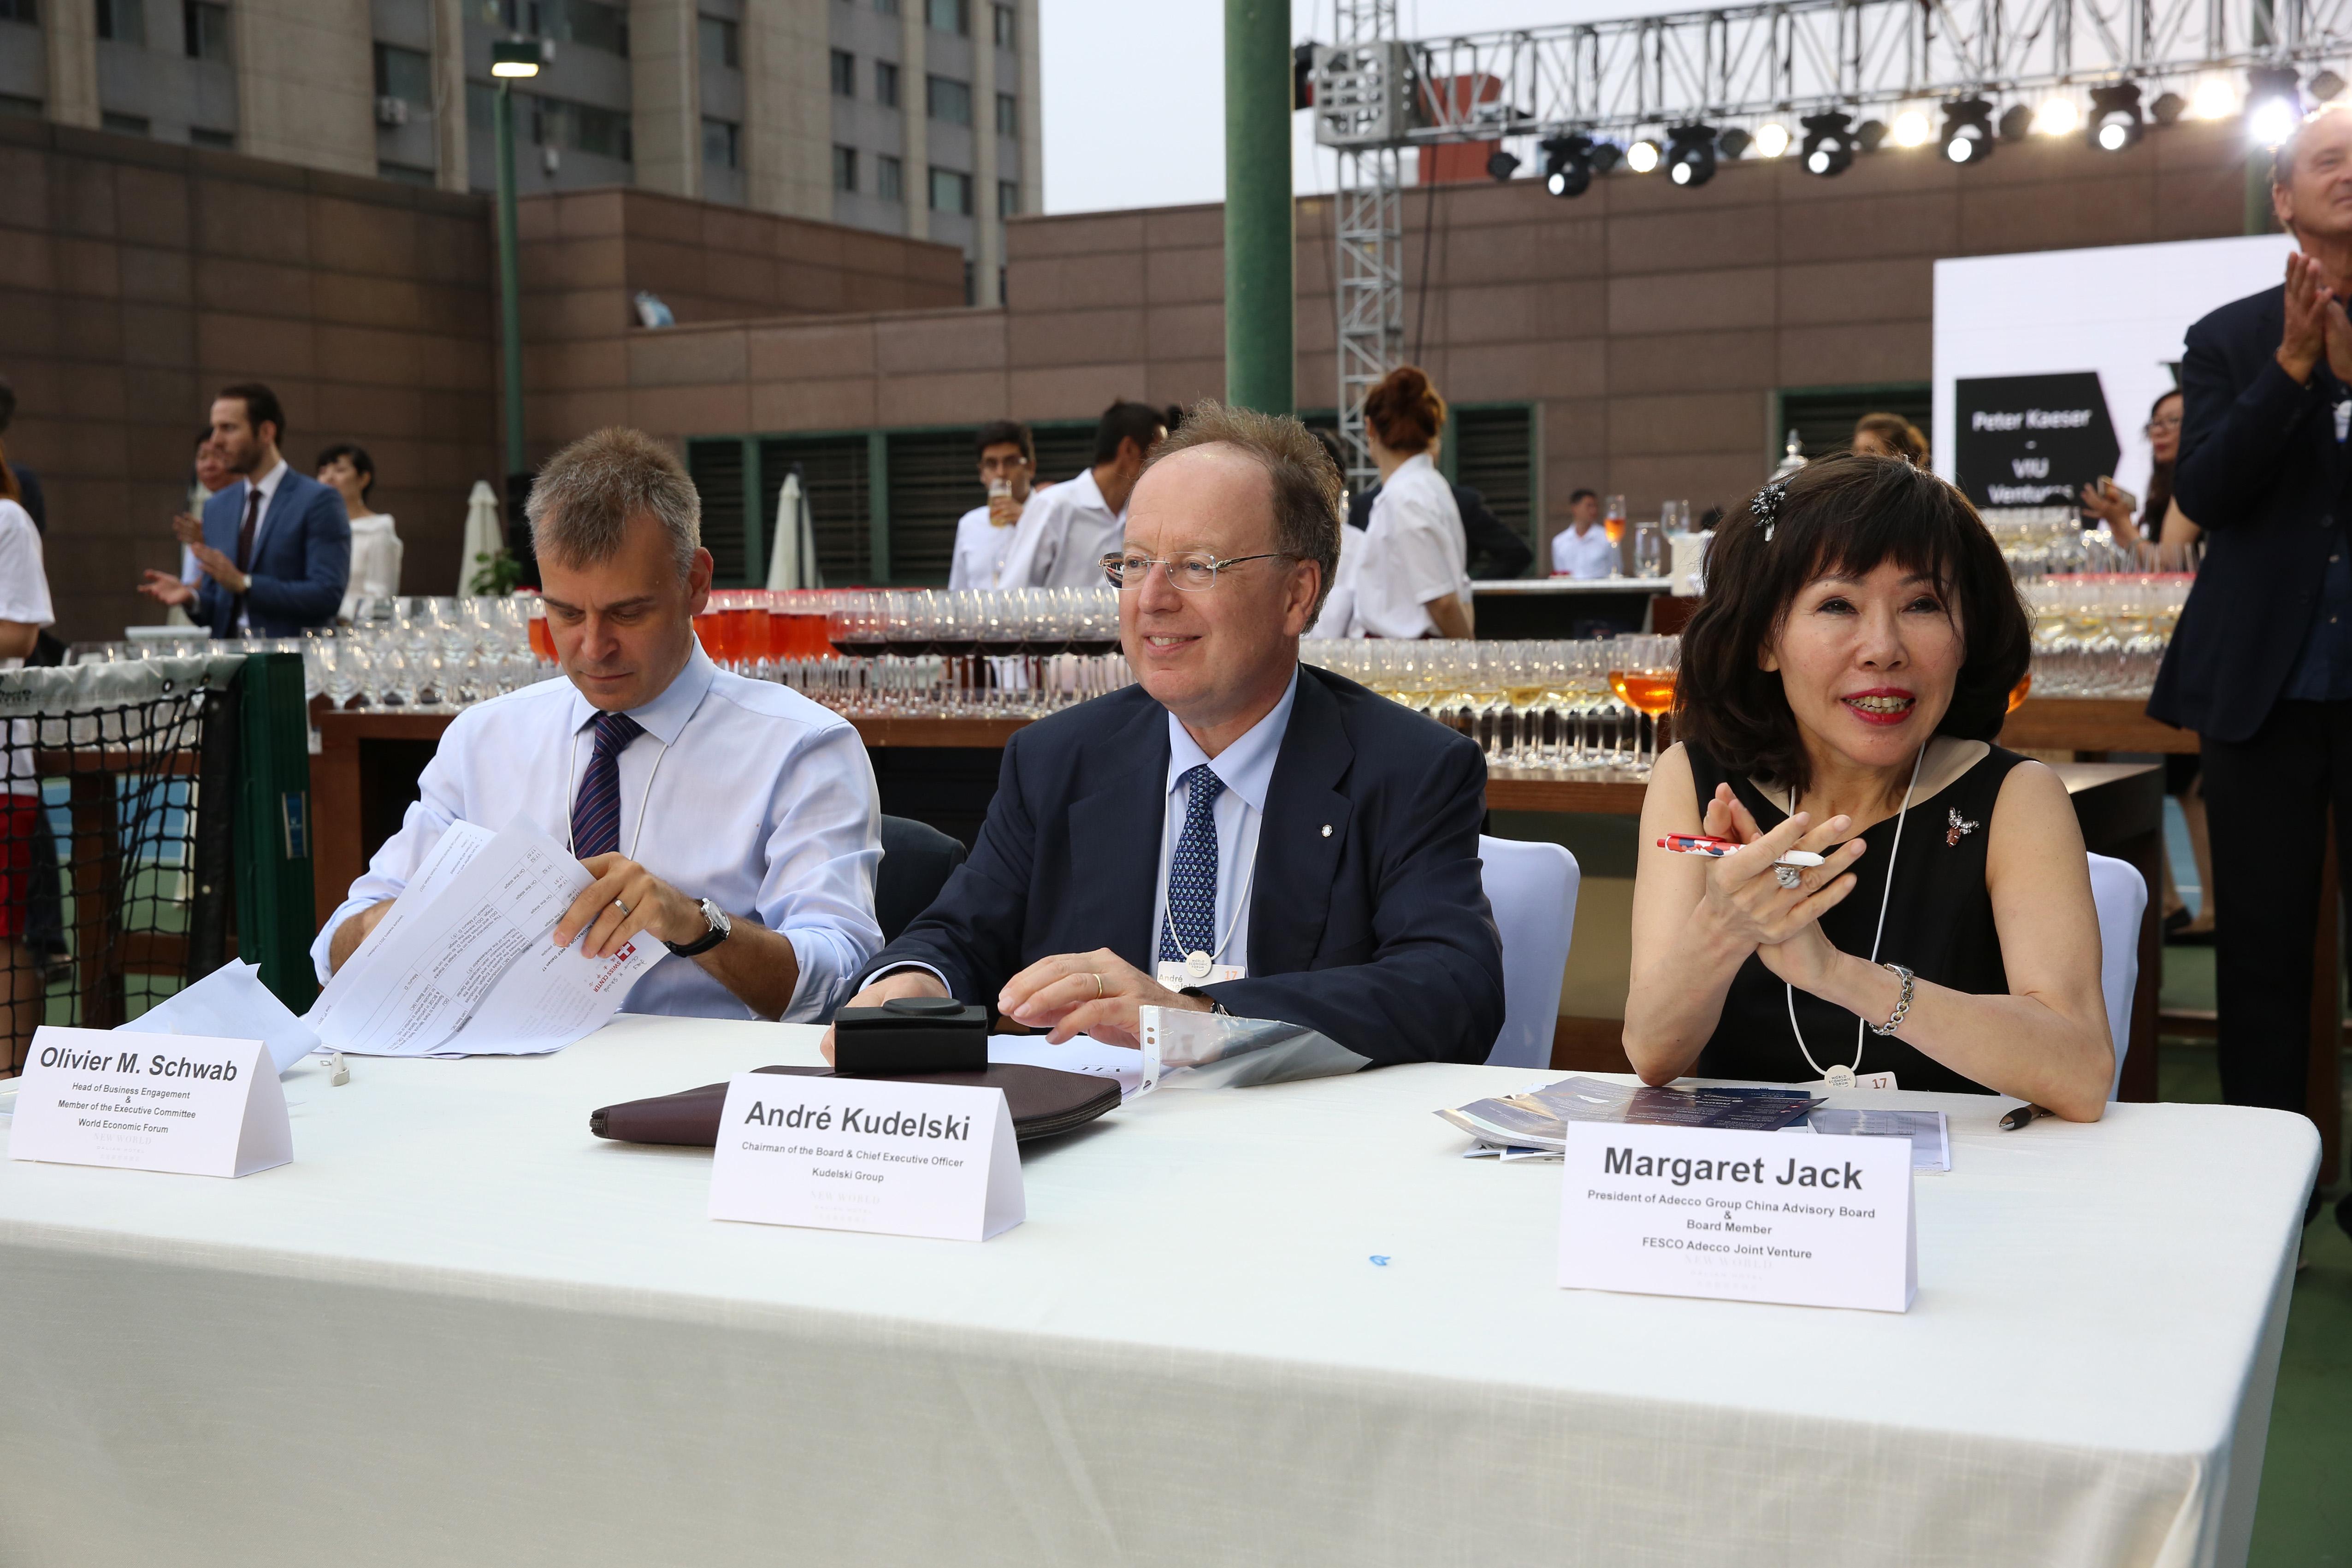 Jury-Schwab, Kudelski & Margaret Jack